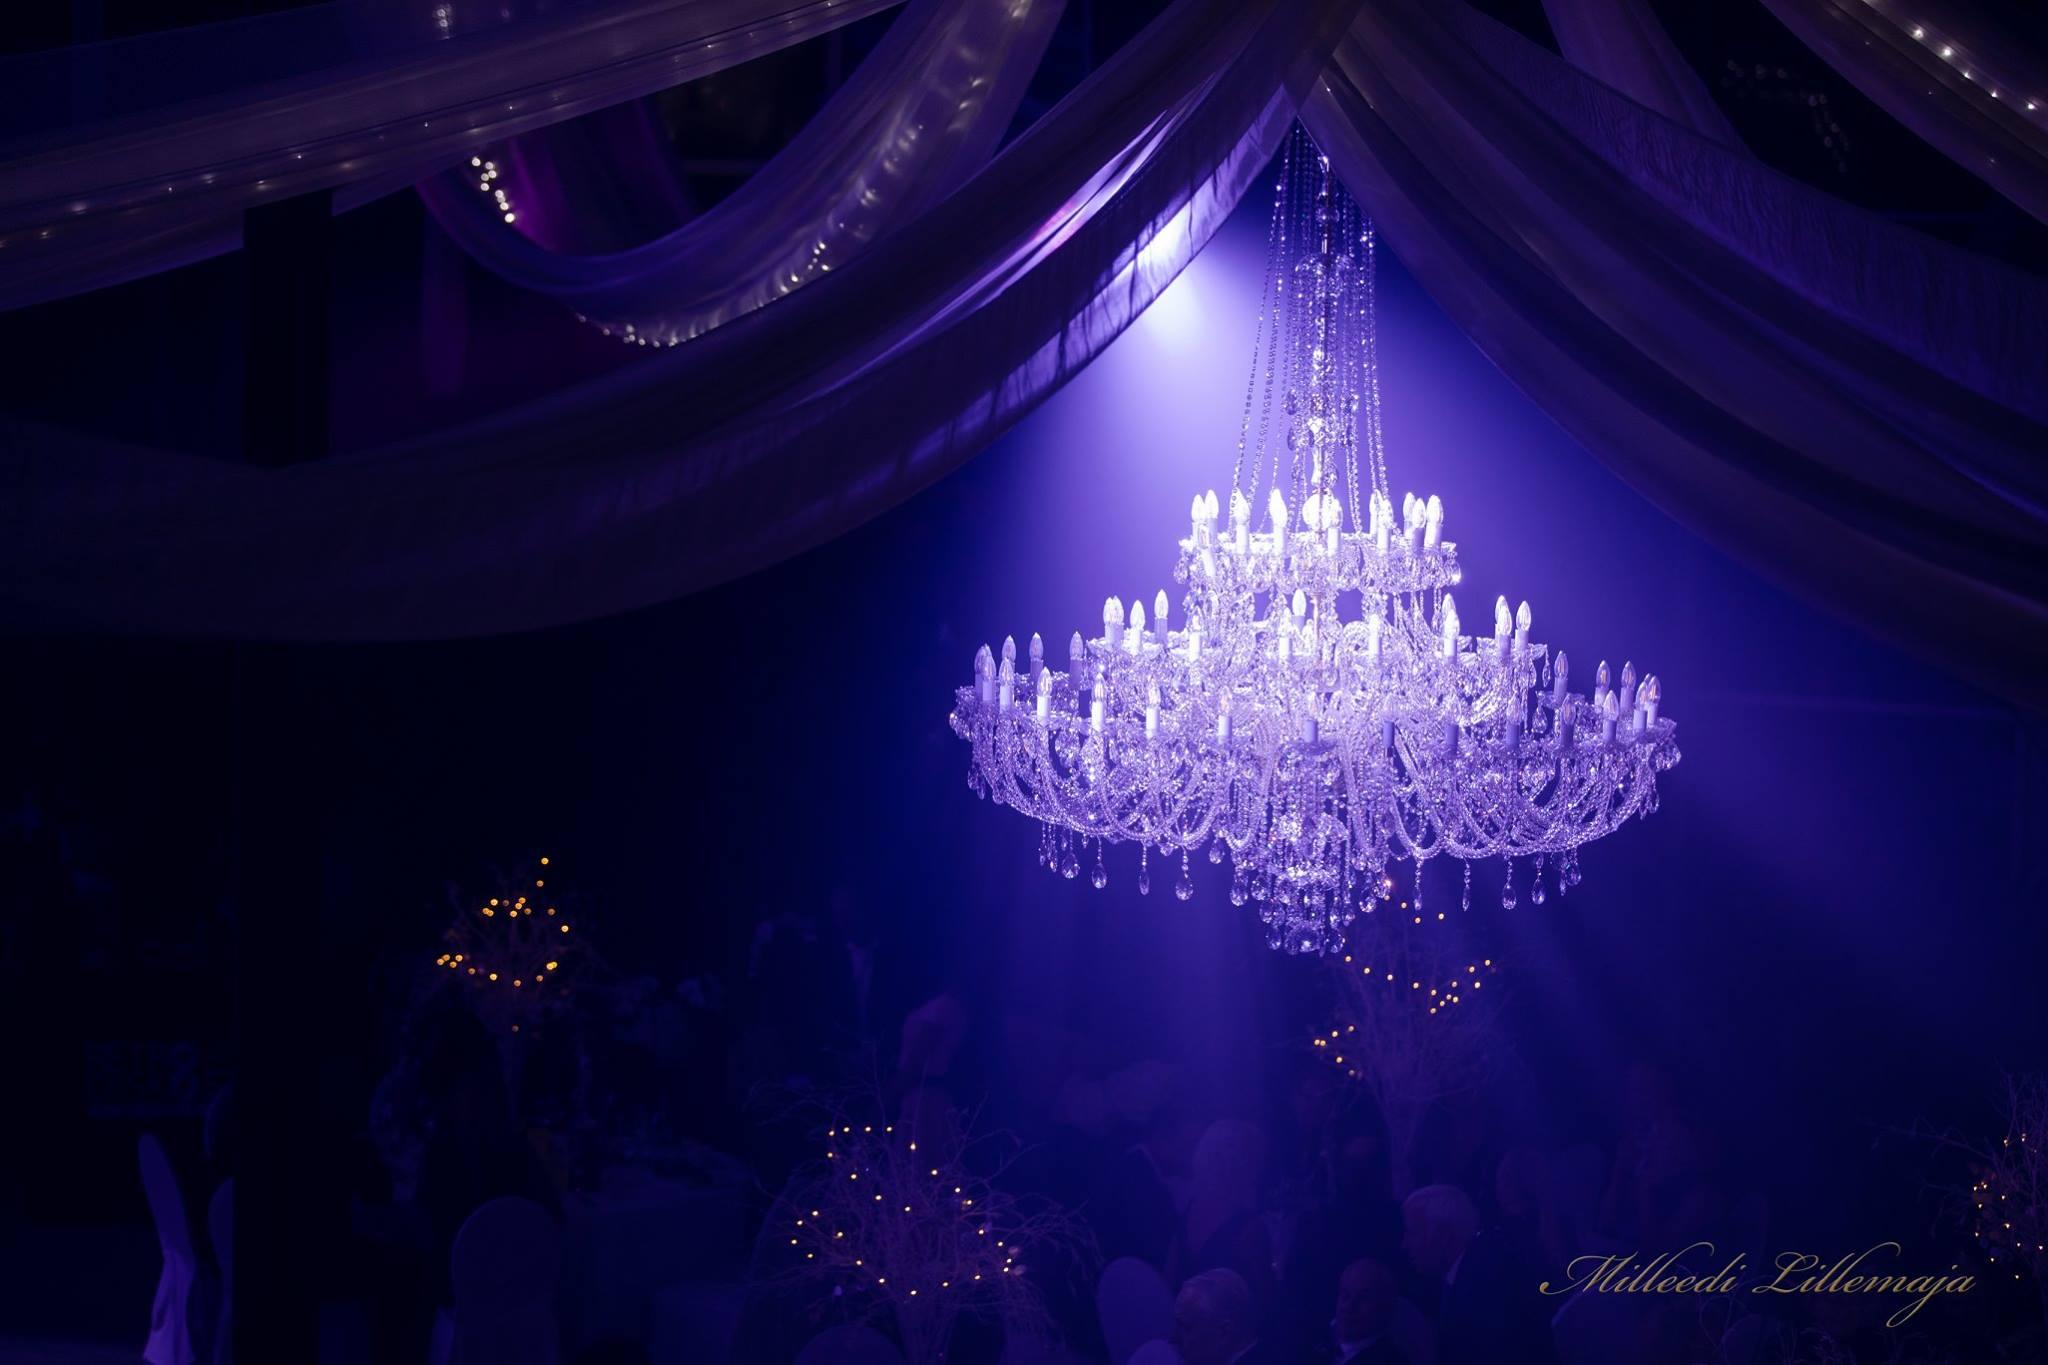 Princesse-60-Wranovsky-crystal-chandelier-Mileedi-1.jpg